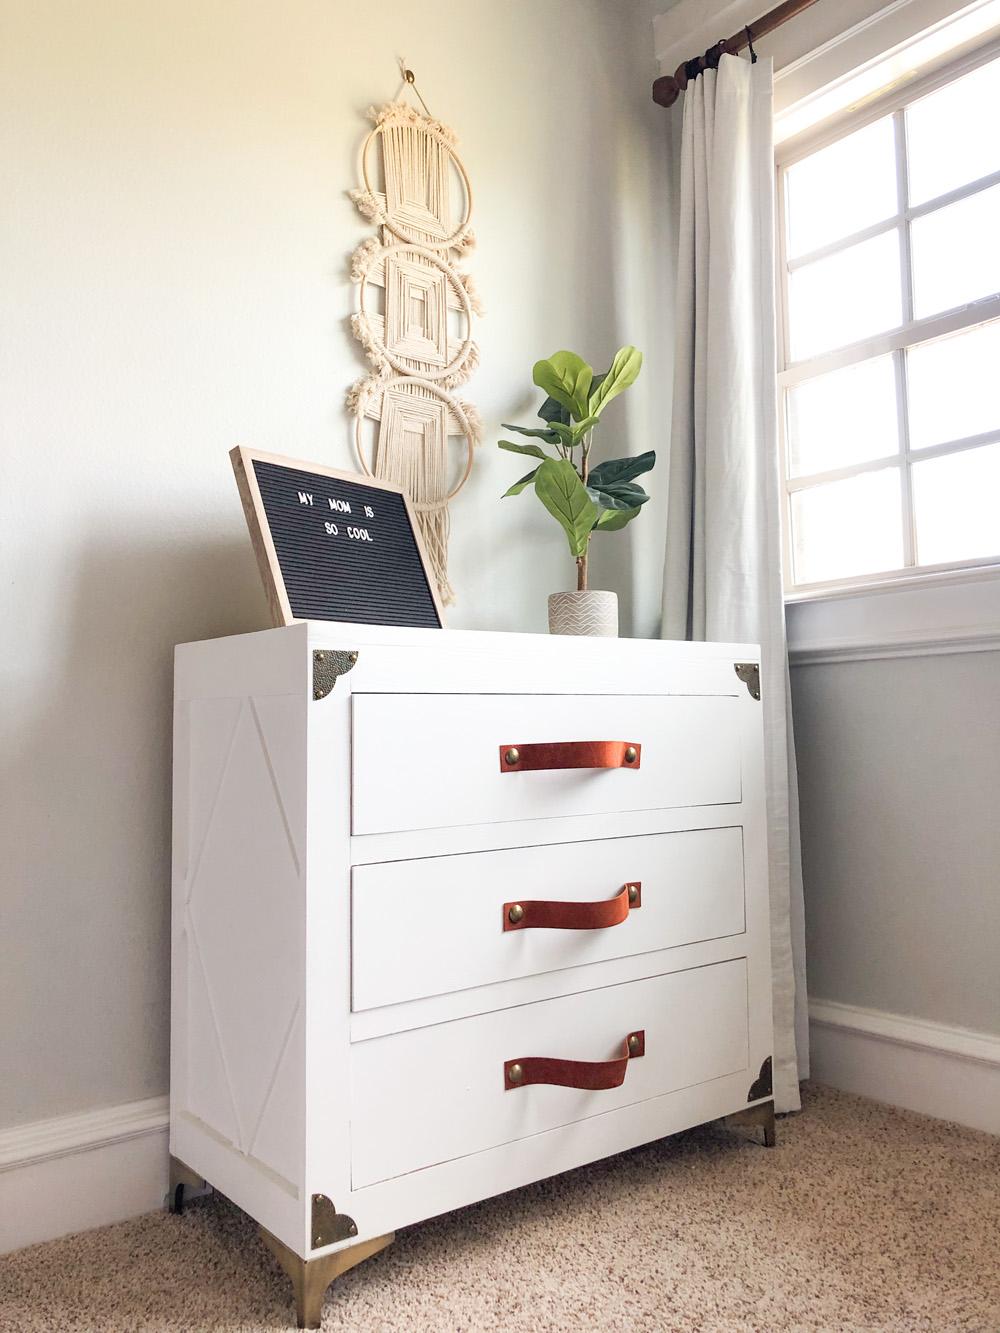 Super Diy Rustic Glam Dresser Shanty 2 Chic Machost Co Dining Chair Design Ideas Machostcouk